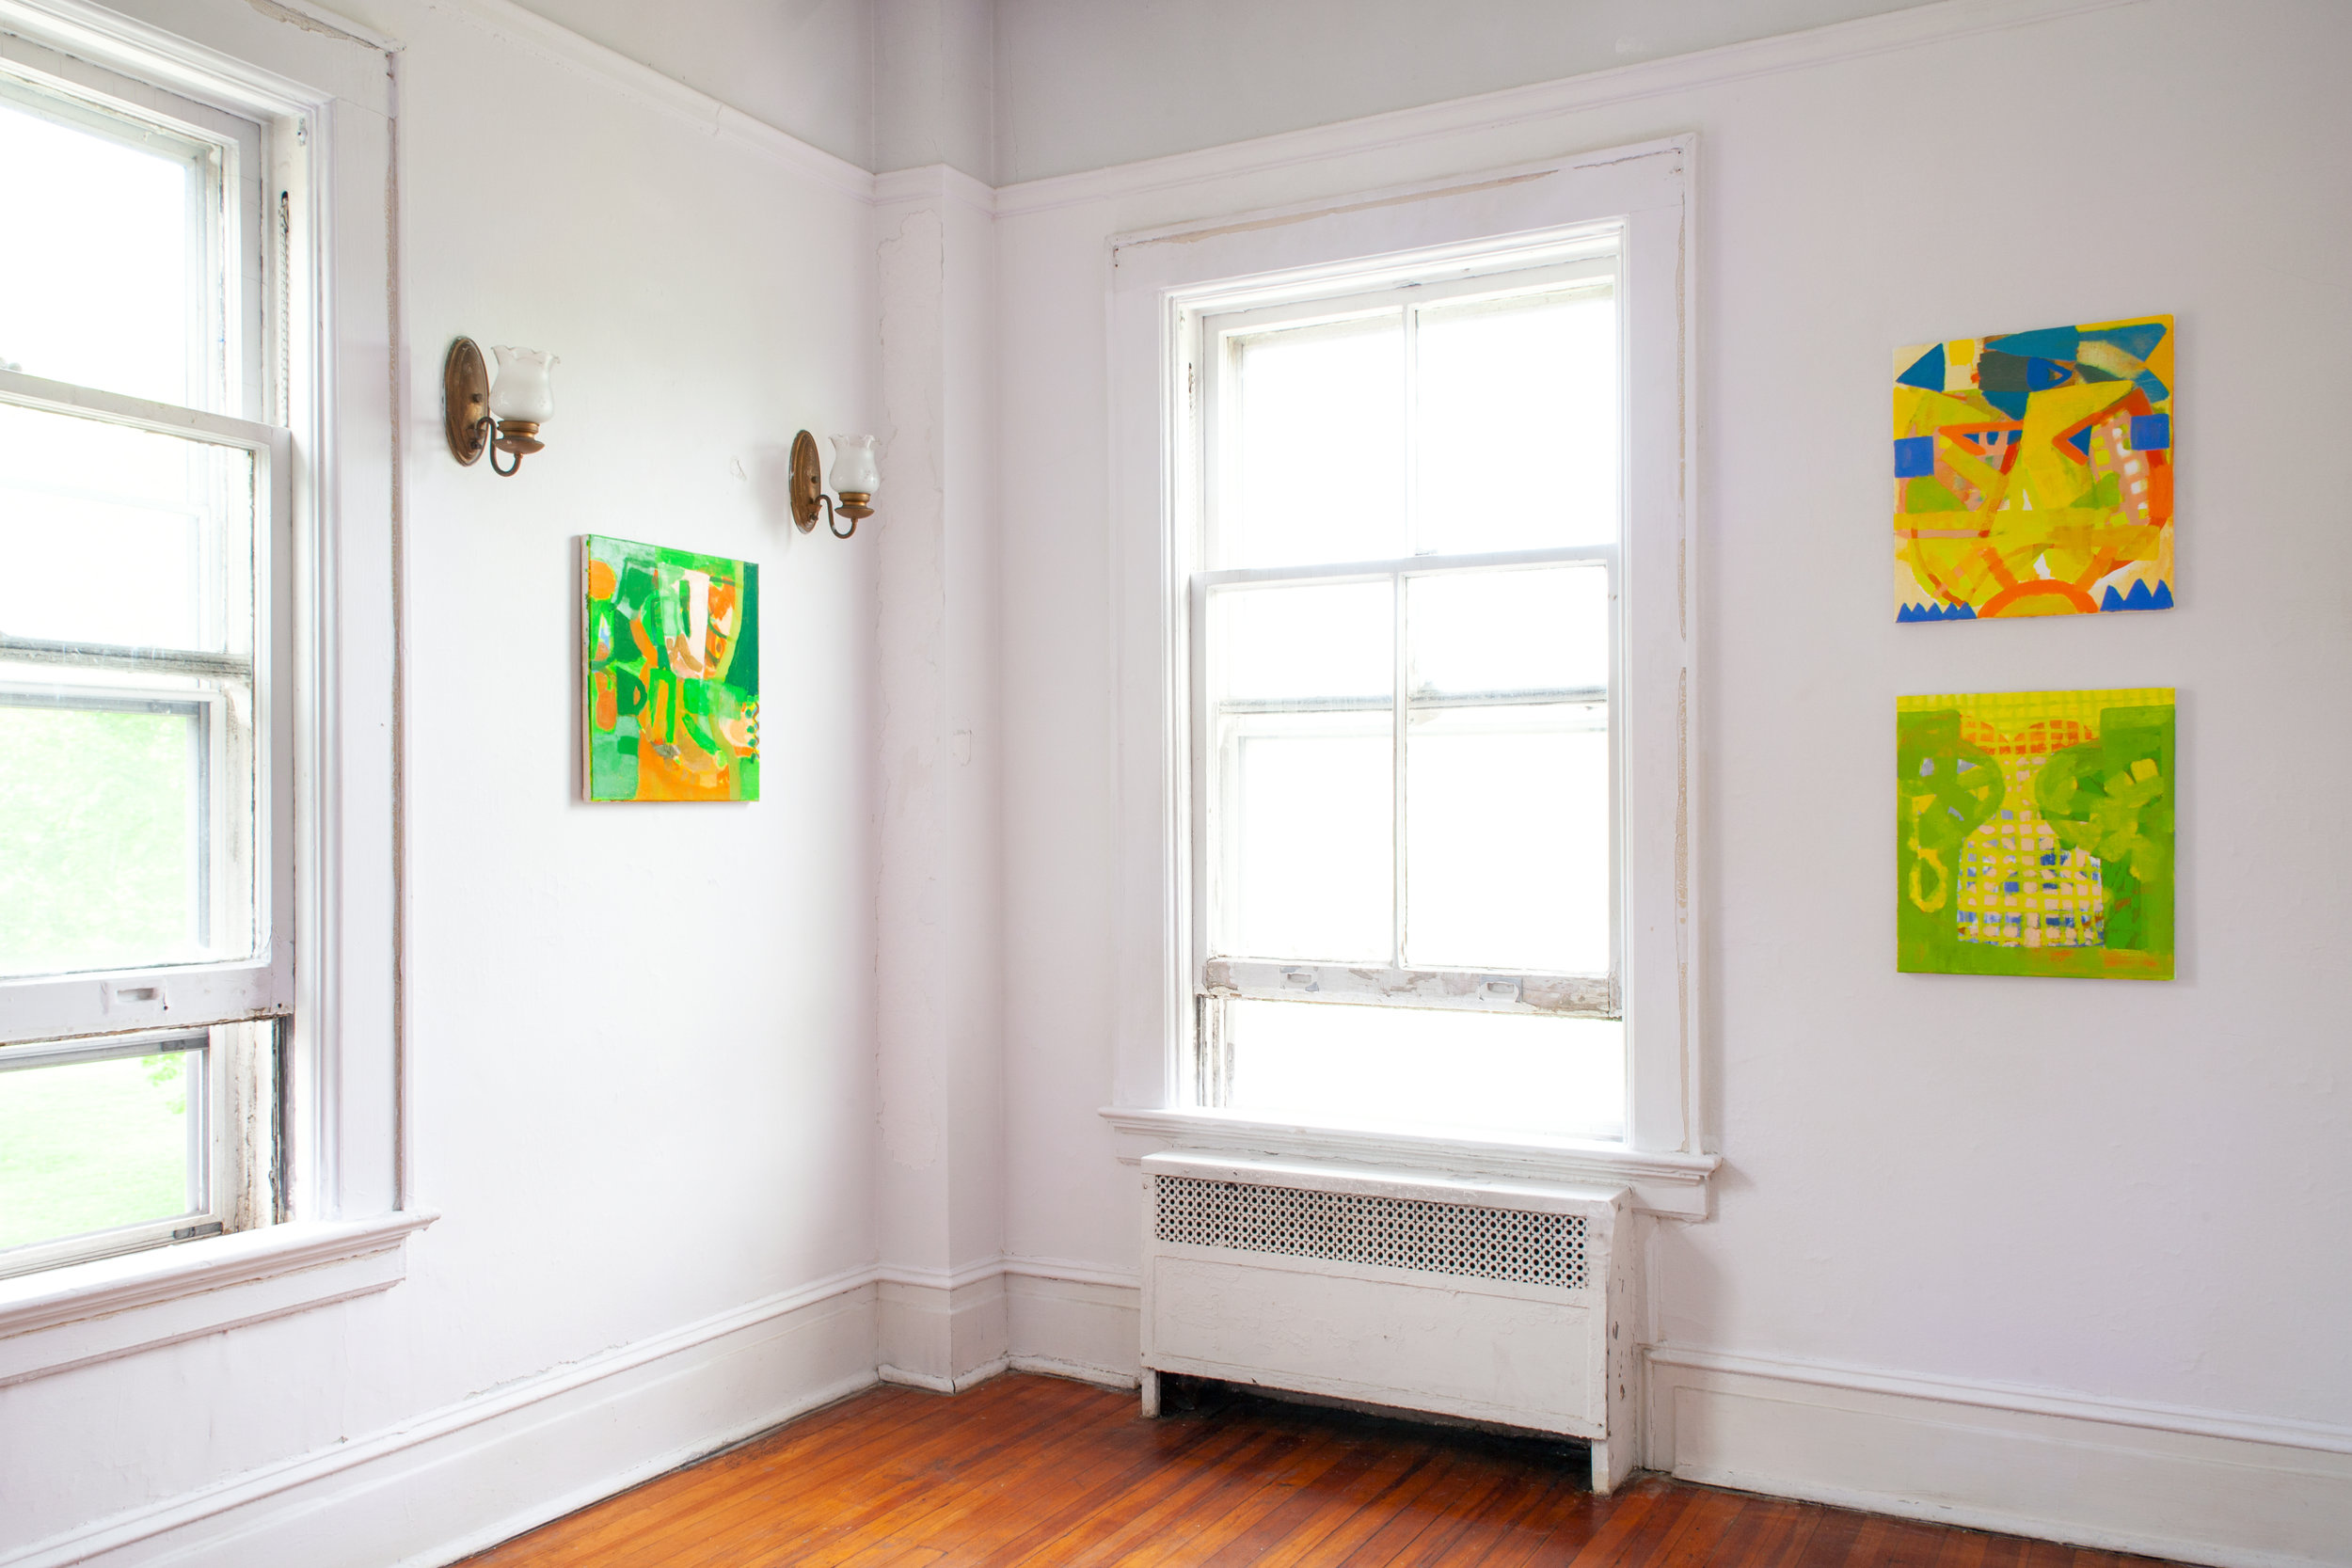 Meghan_Brady-NADA_House-2019-installation_view_13.jpg